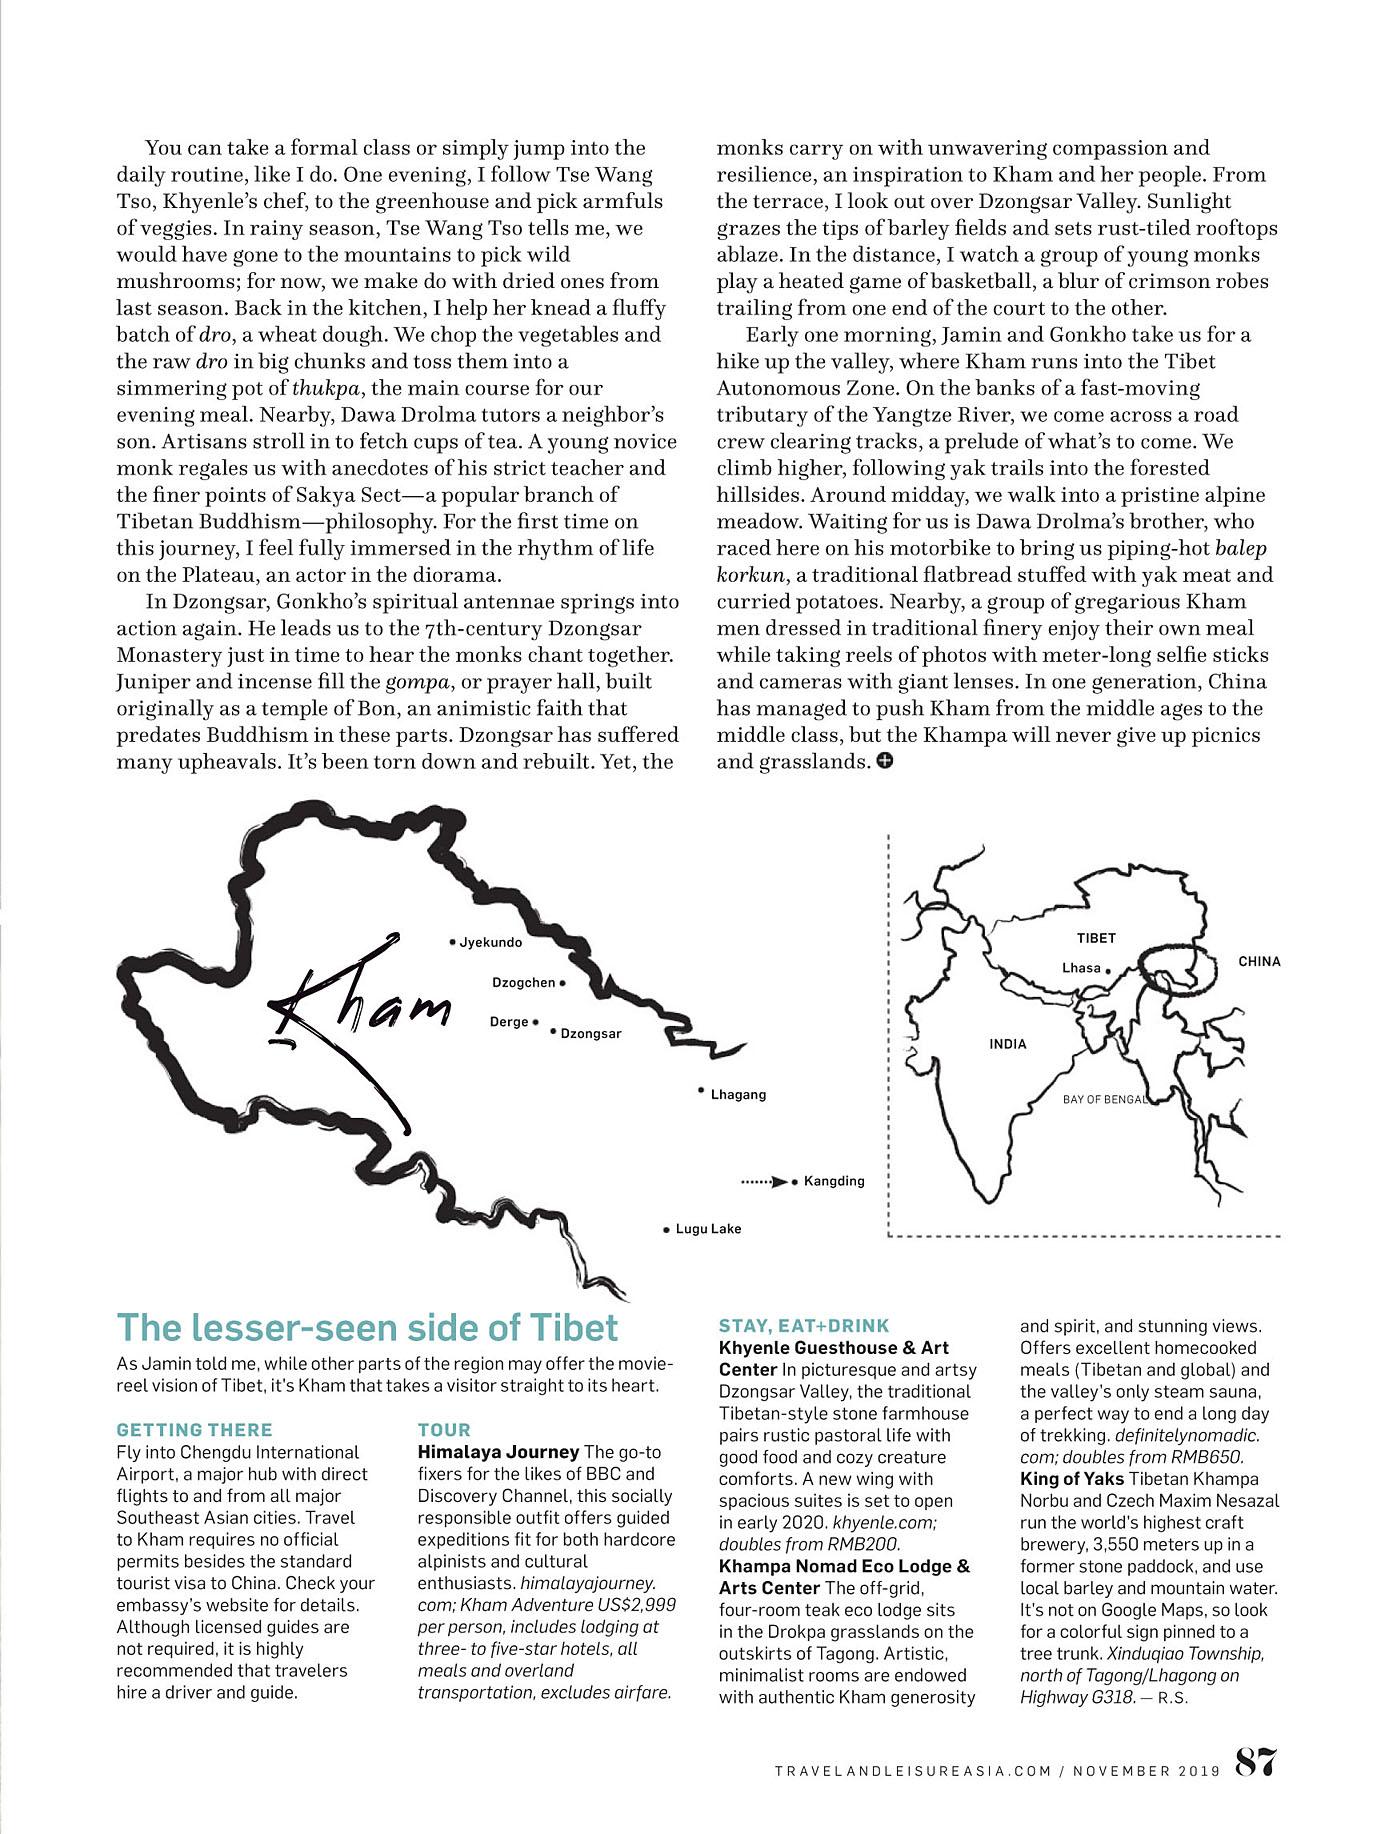 Travel & Leisure SE Asia 2019-11 Tibet 12.jpg